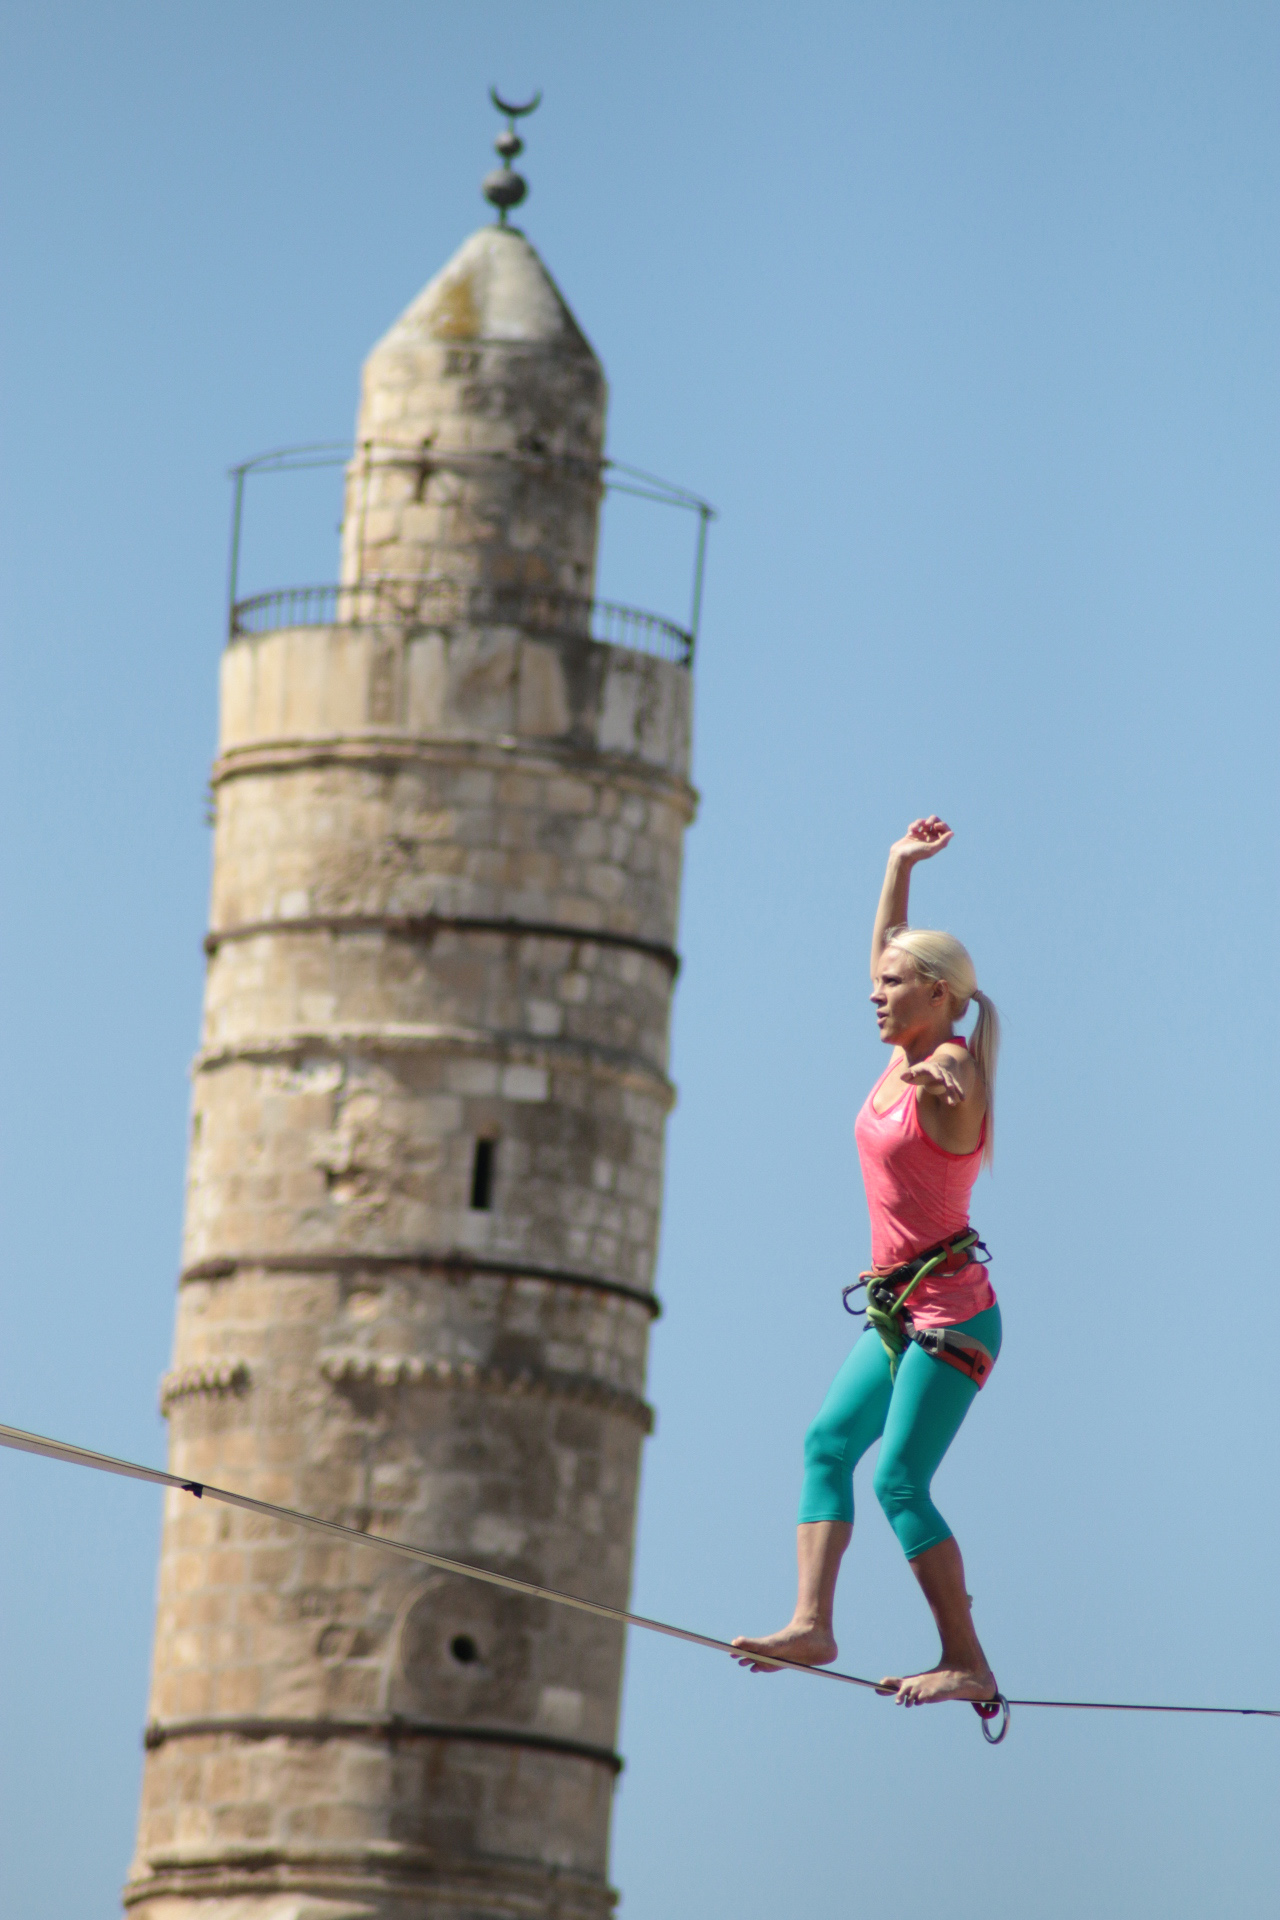 Heather Larsen in Jerusalem. Photo by Tower of David Museum